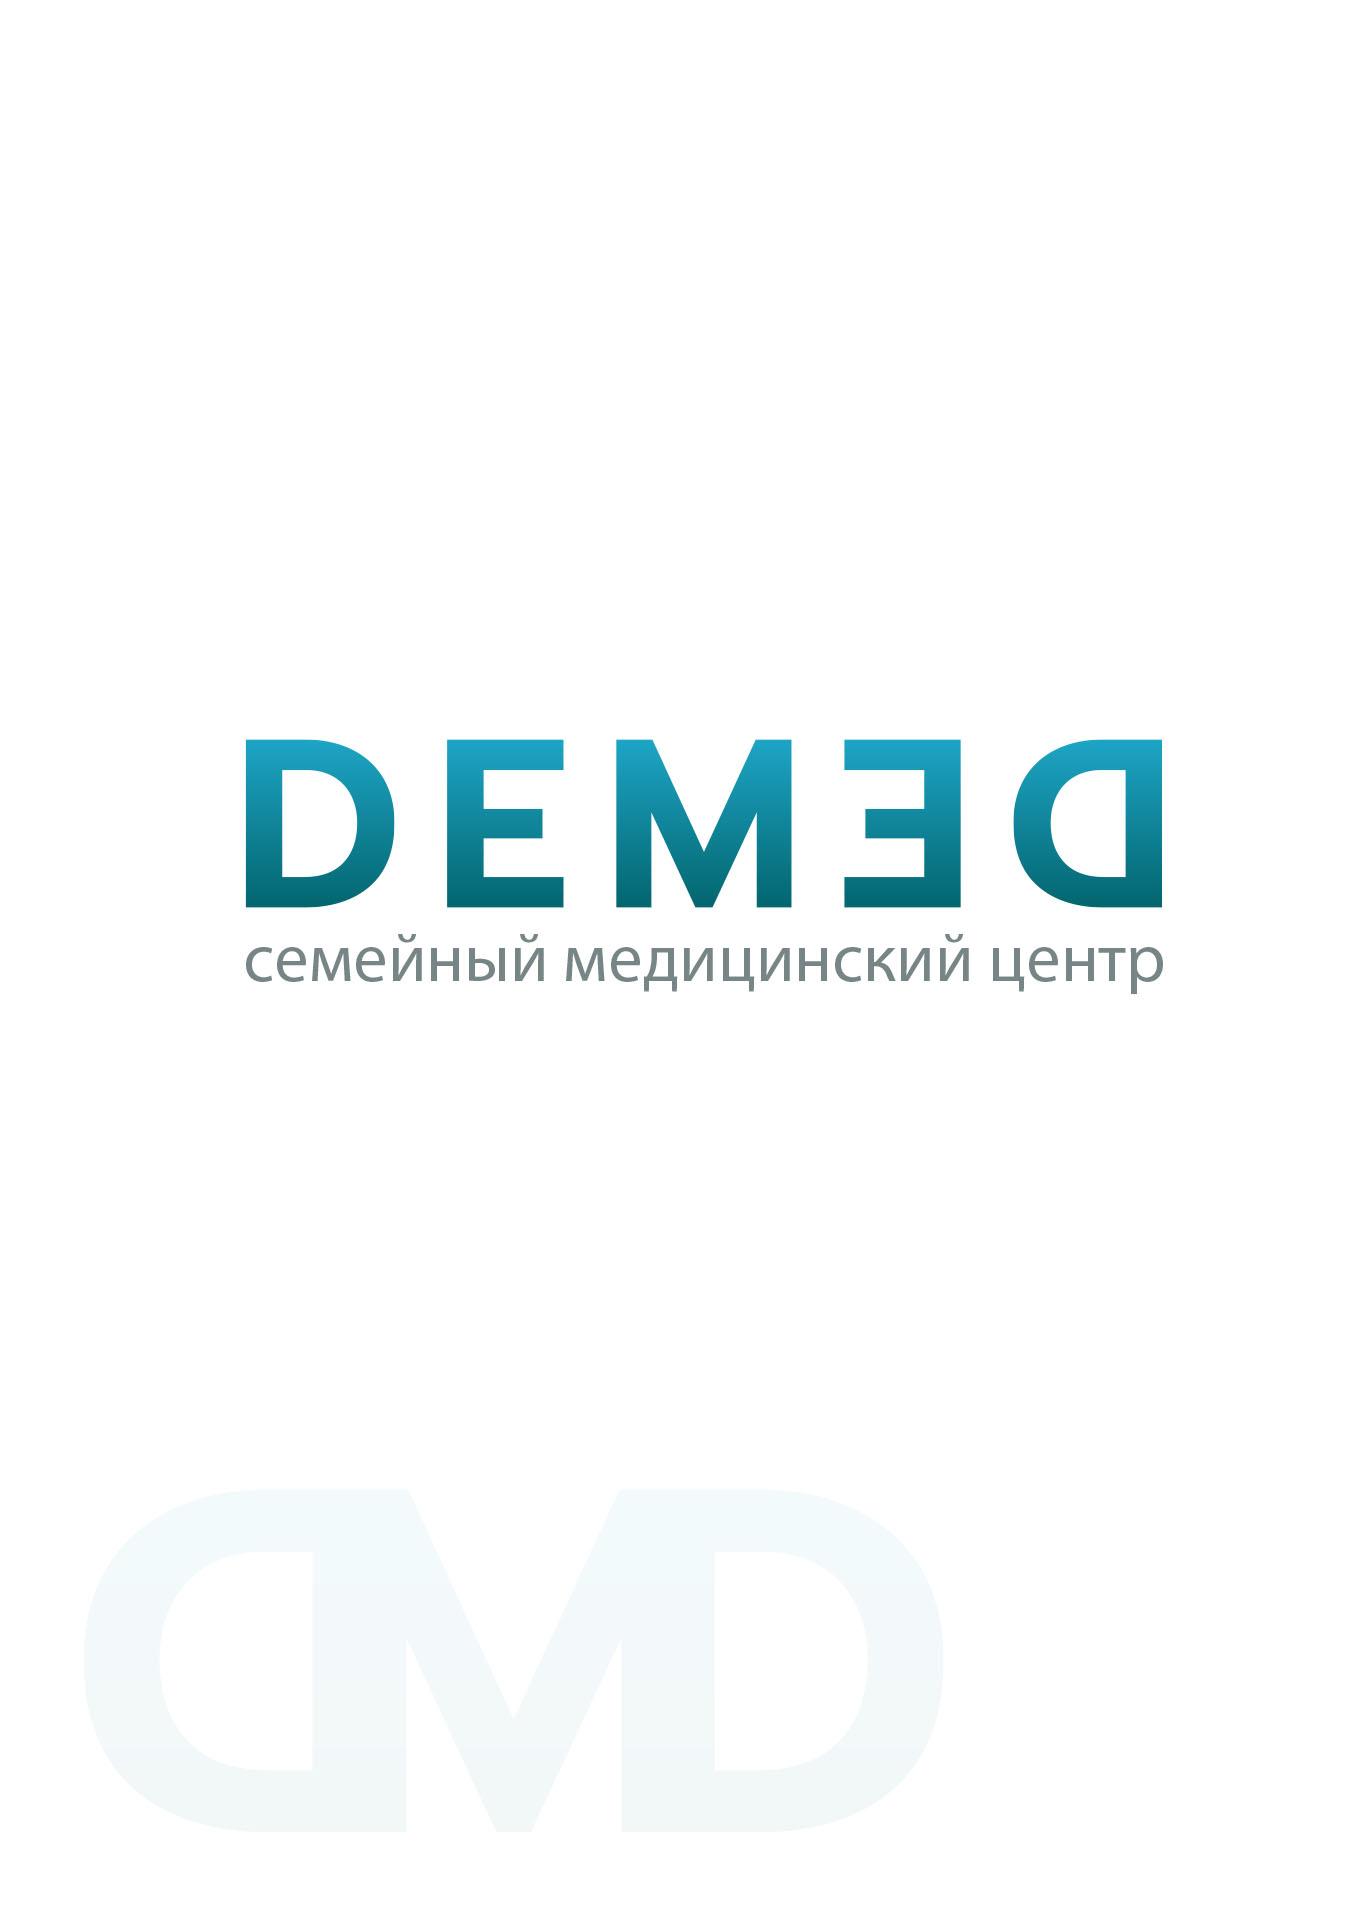 Логотип медицинского центра фото f_0955dc5140cea967.jpg